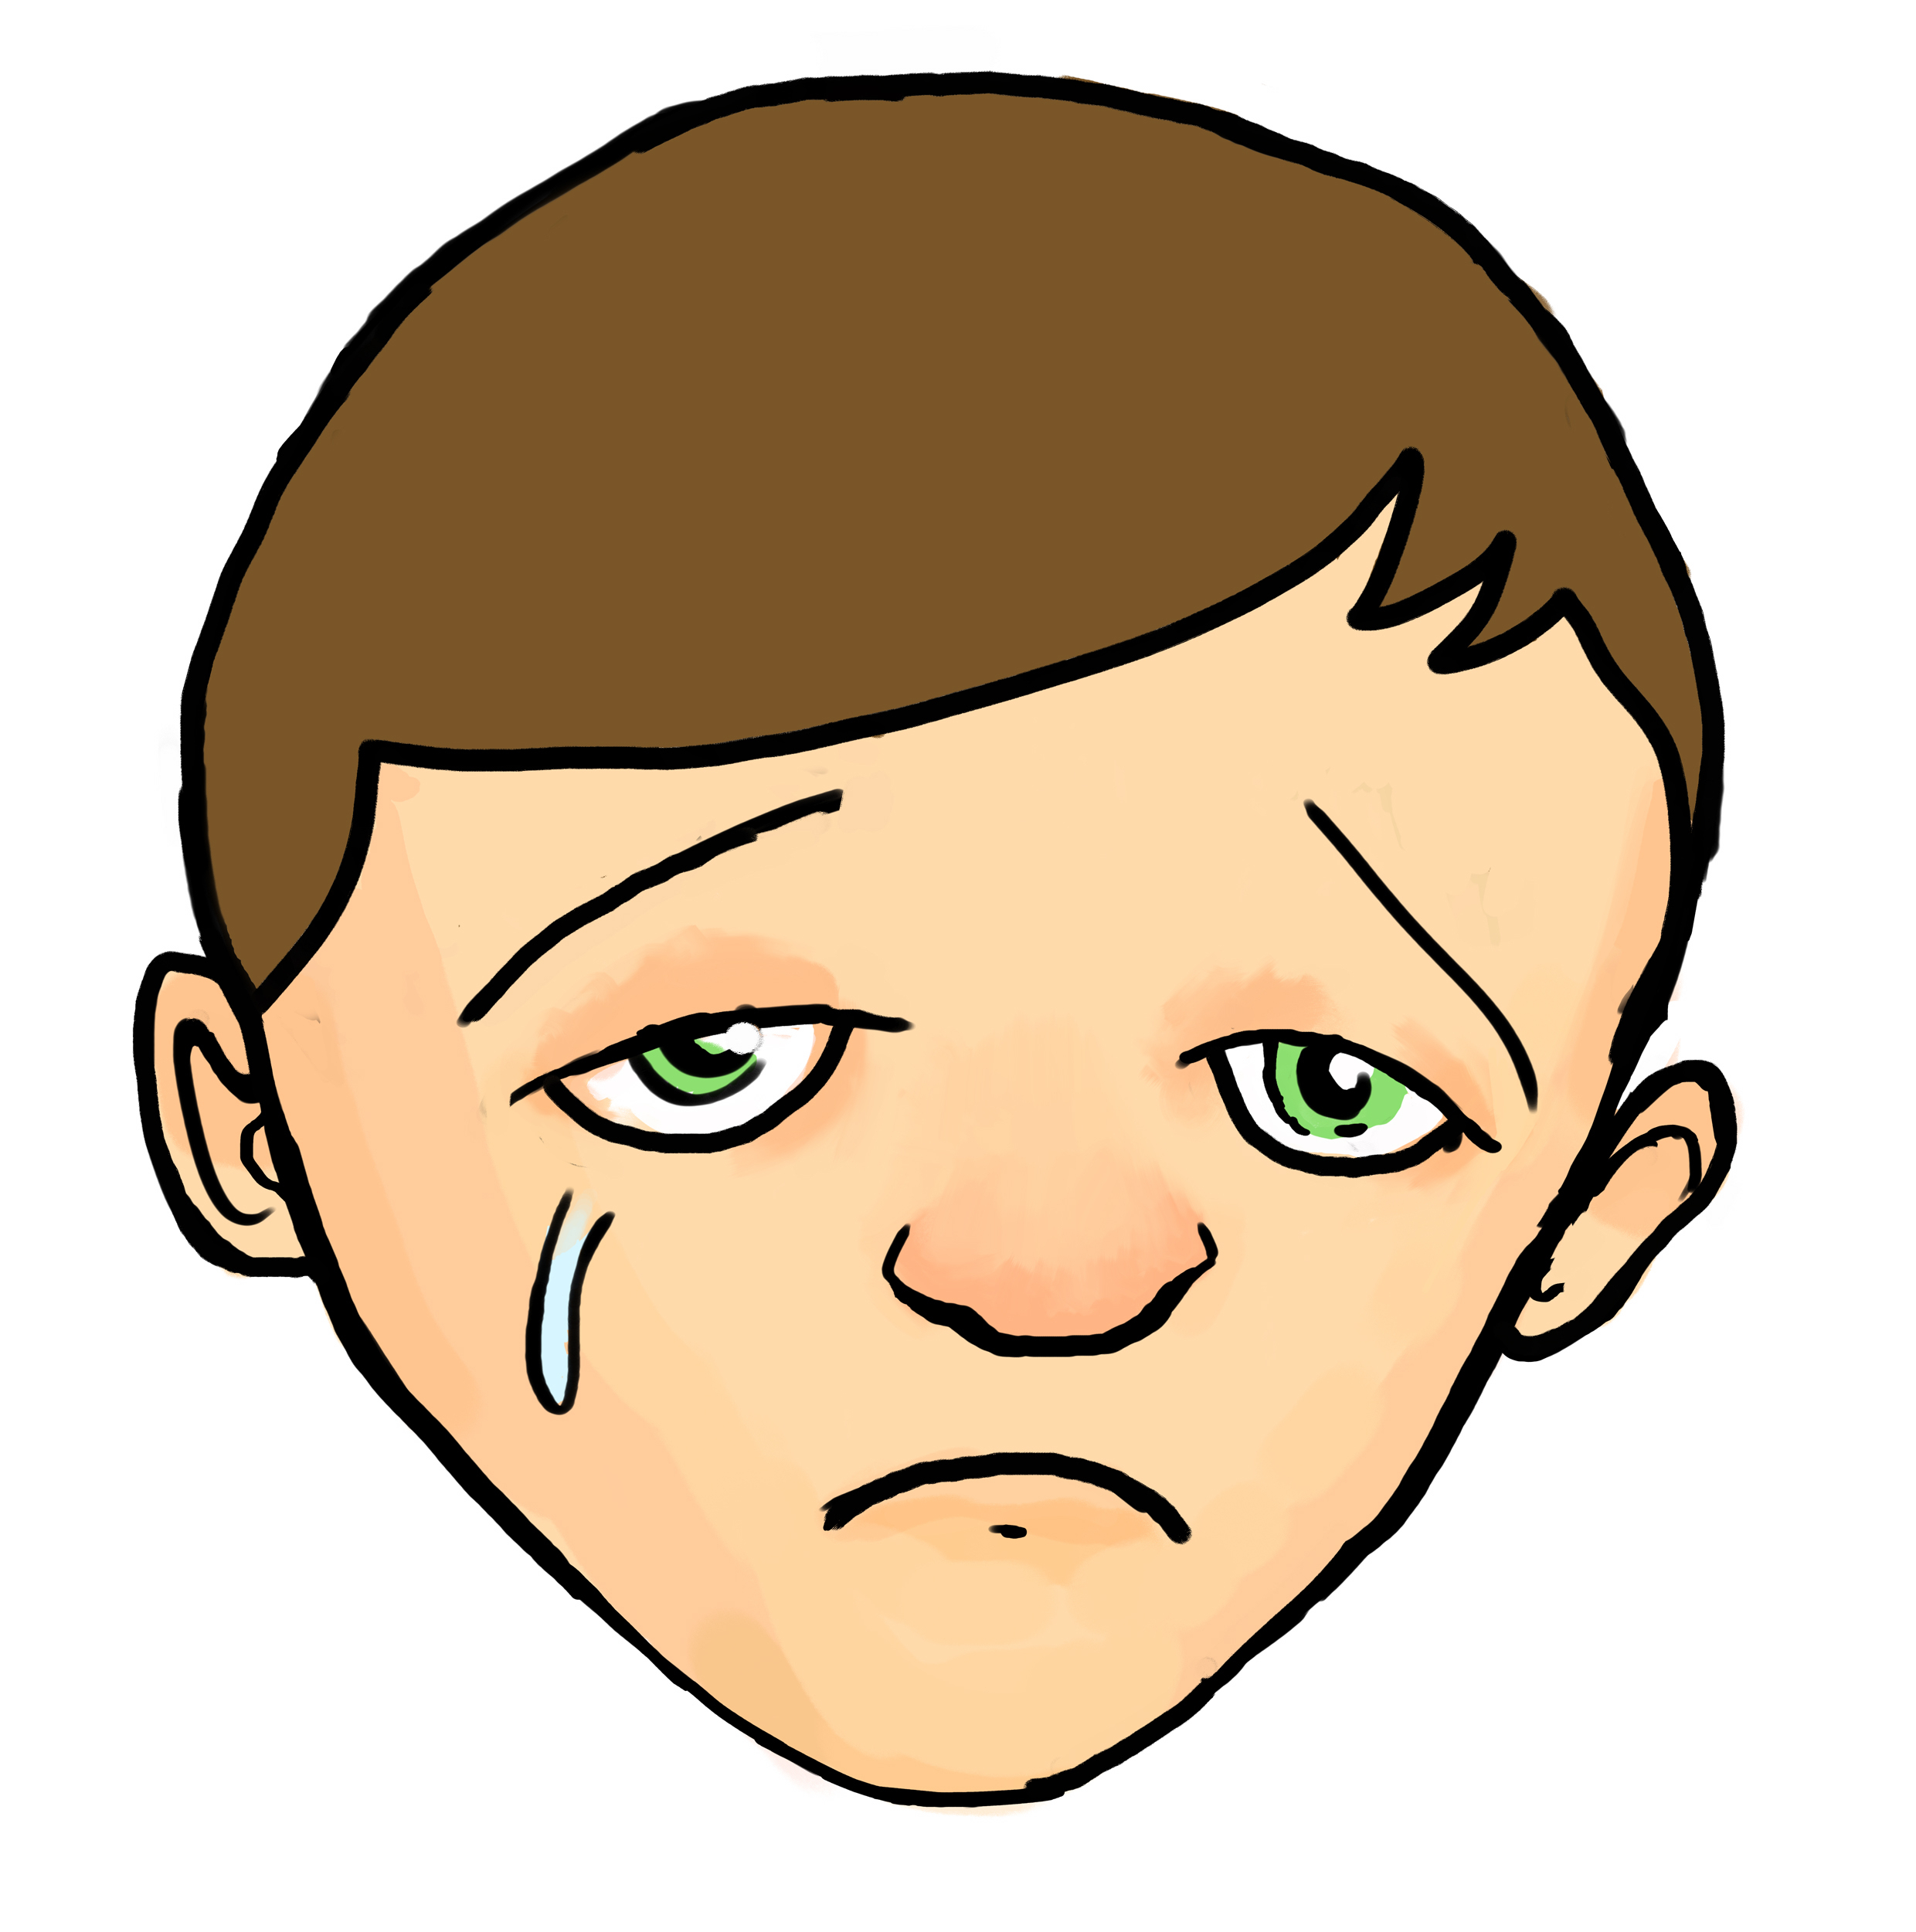 2480x2501 Cartoon Sad Boy Face Drawing Anime Boys Sad Face Sad Anime Boy